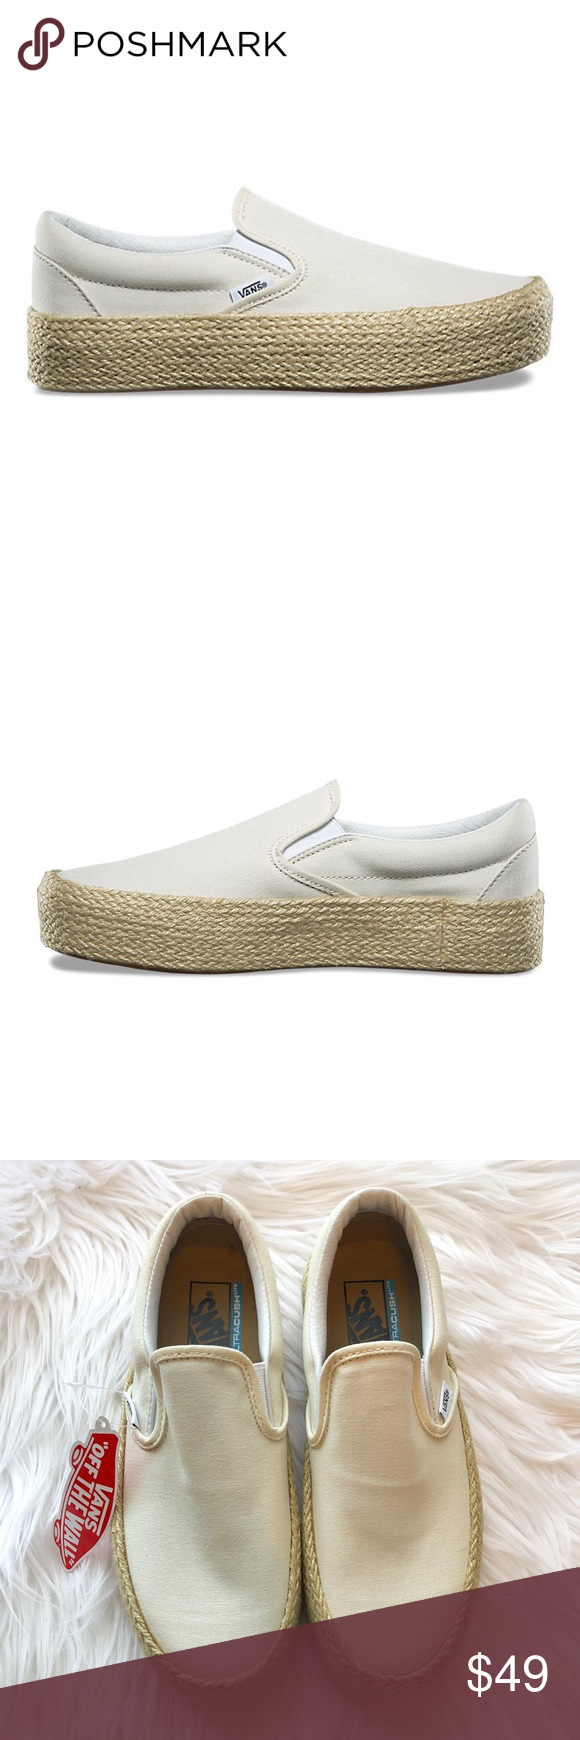 e58dbfa88d NIB    Vans Slip-On Platform Espadrille Sneaker NIB Vans Slip-On Platform  Espadrille Sneakers in Marshmallow. Women s US 7 The Vans Classic Slip-on  Platform ...